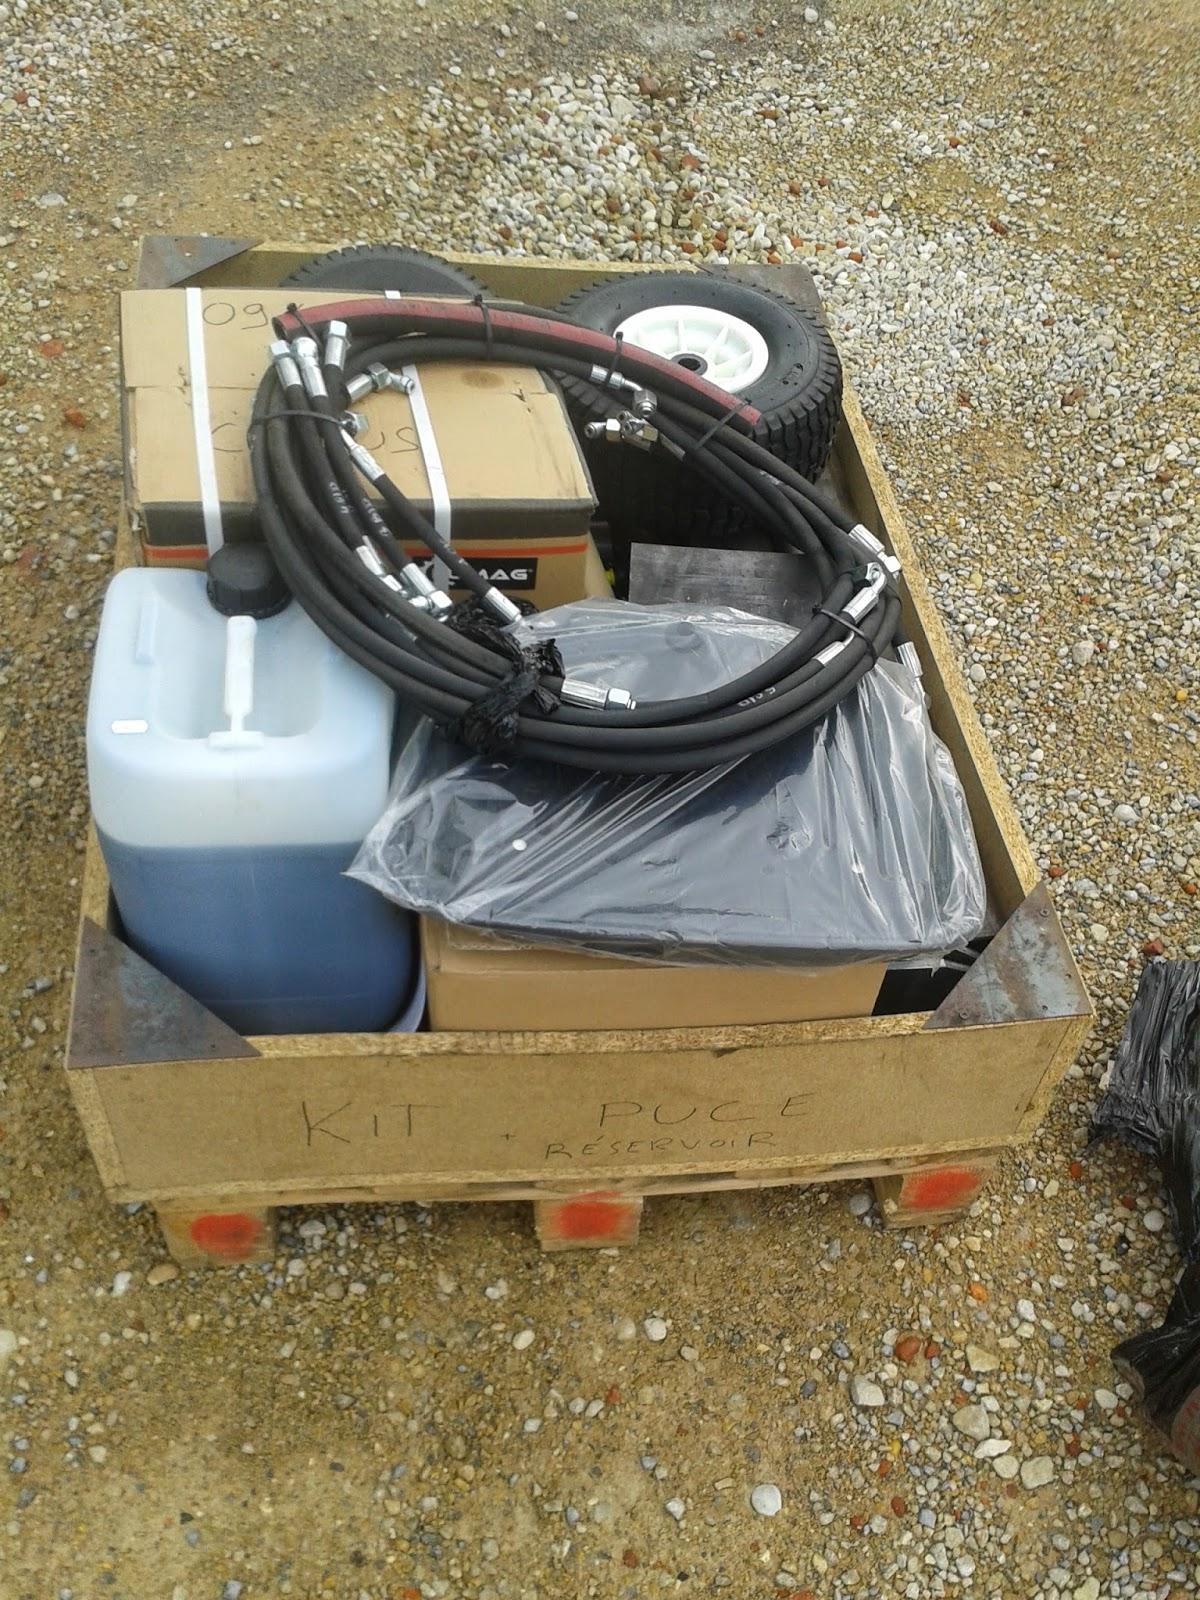 kit pelle hydraulique petite pelle